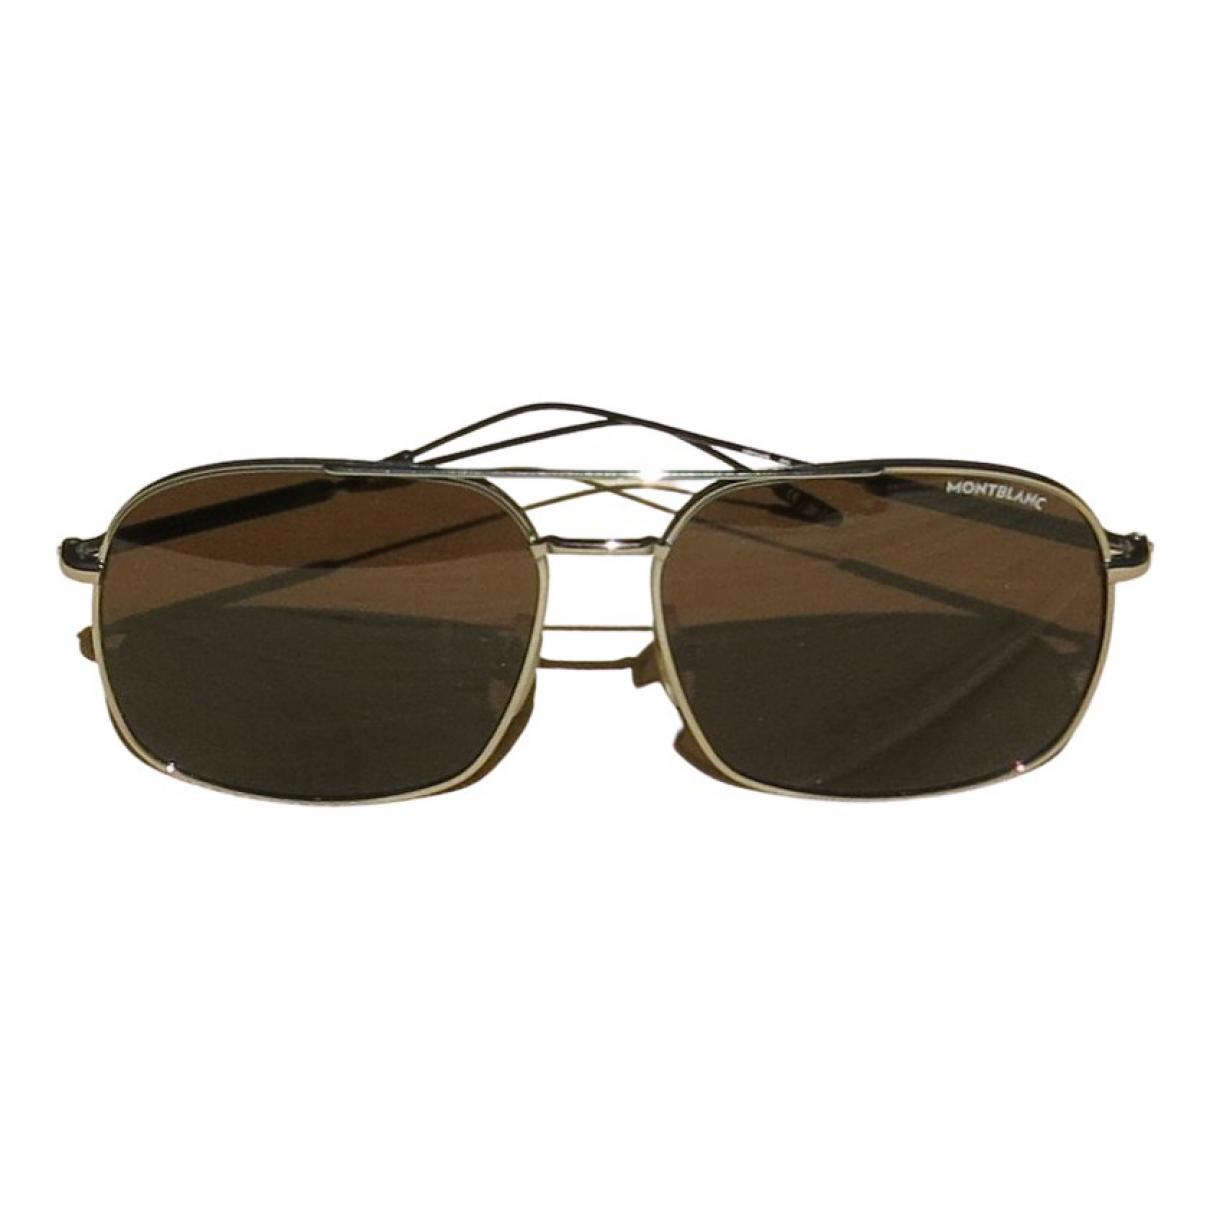 Gafas Montblanc